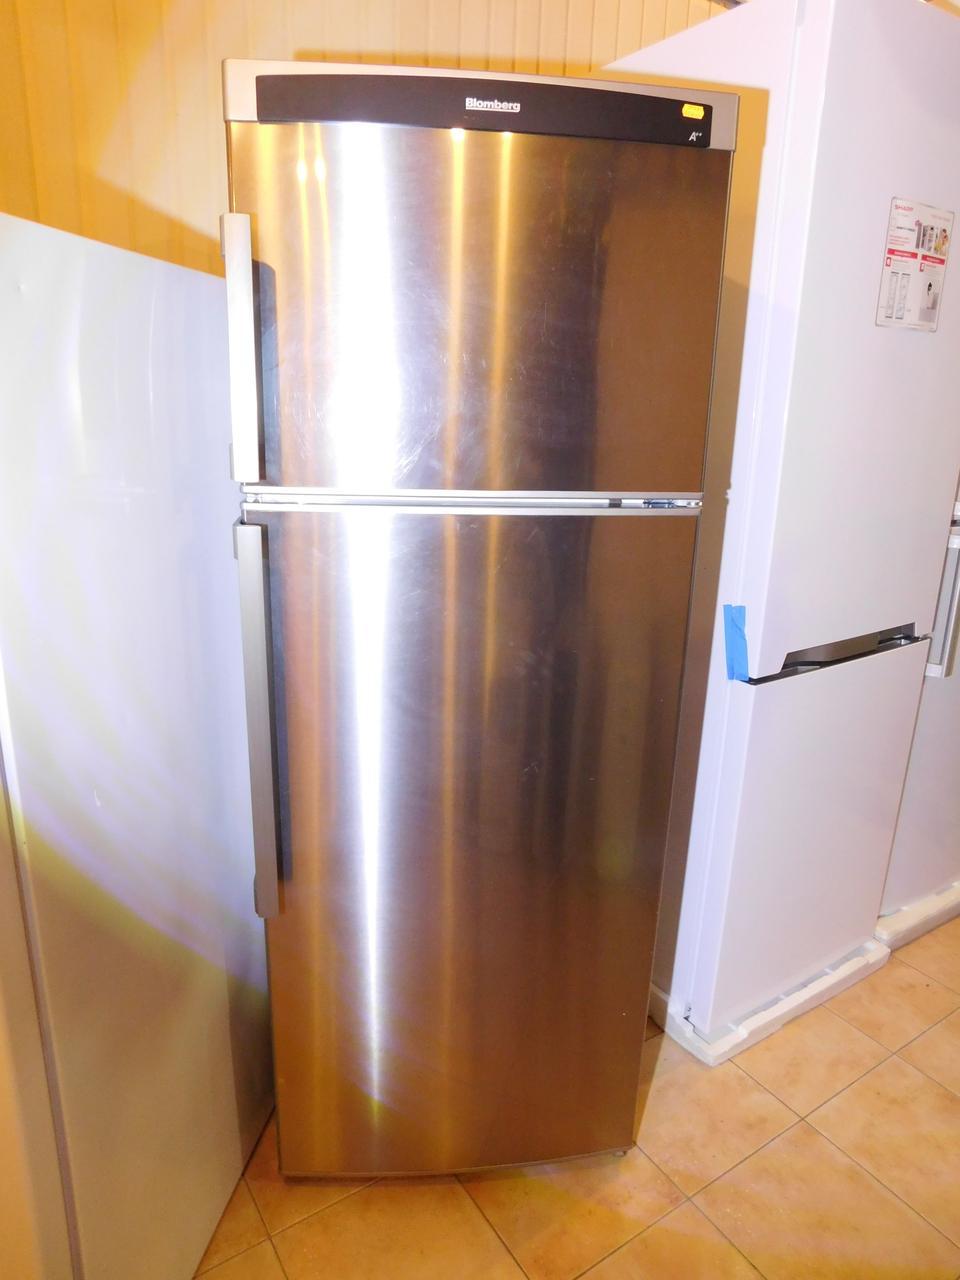 Холодильник двухкамерный Blomberg А++ б\у, Германия